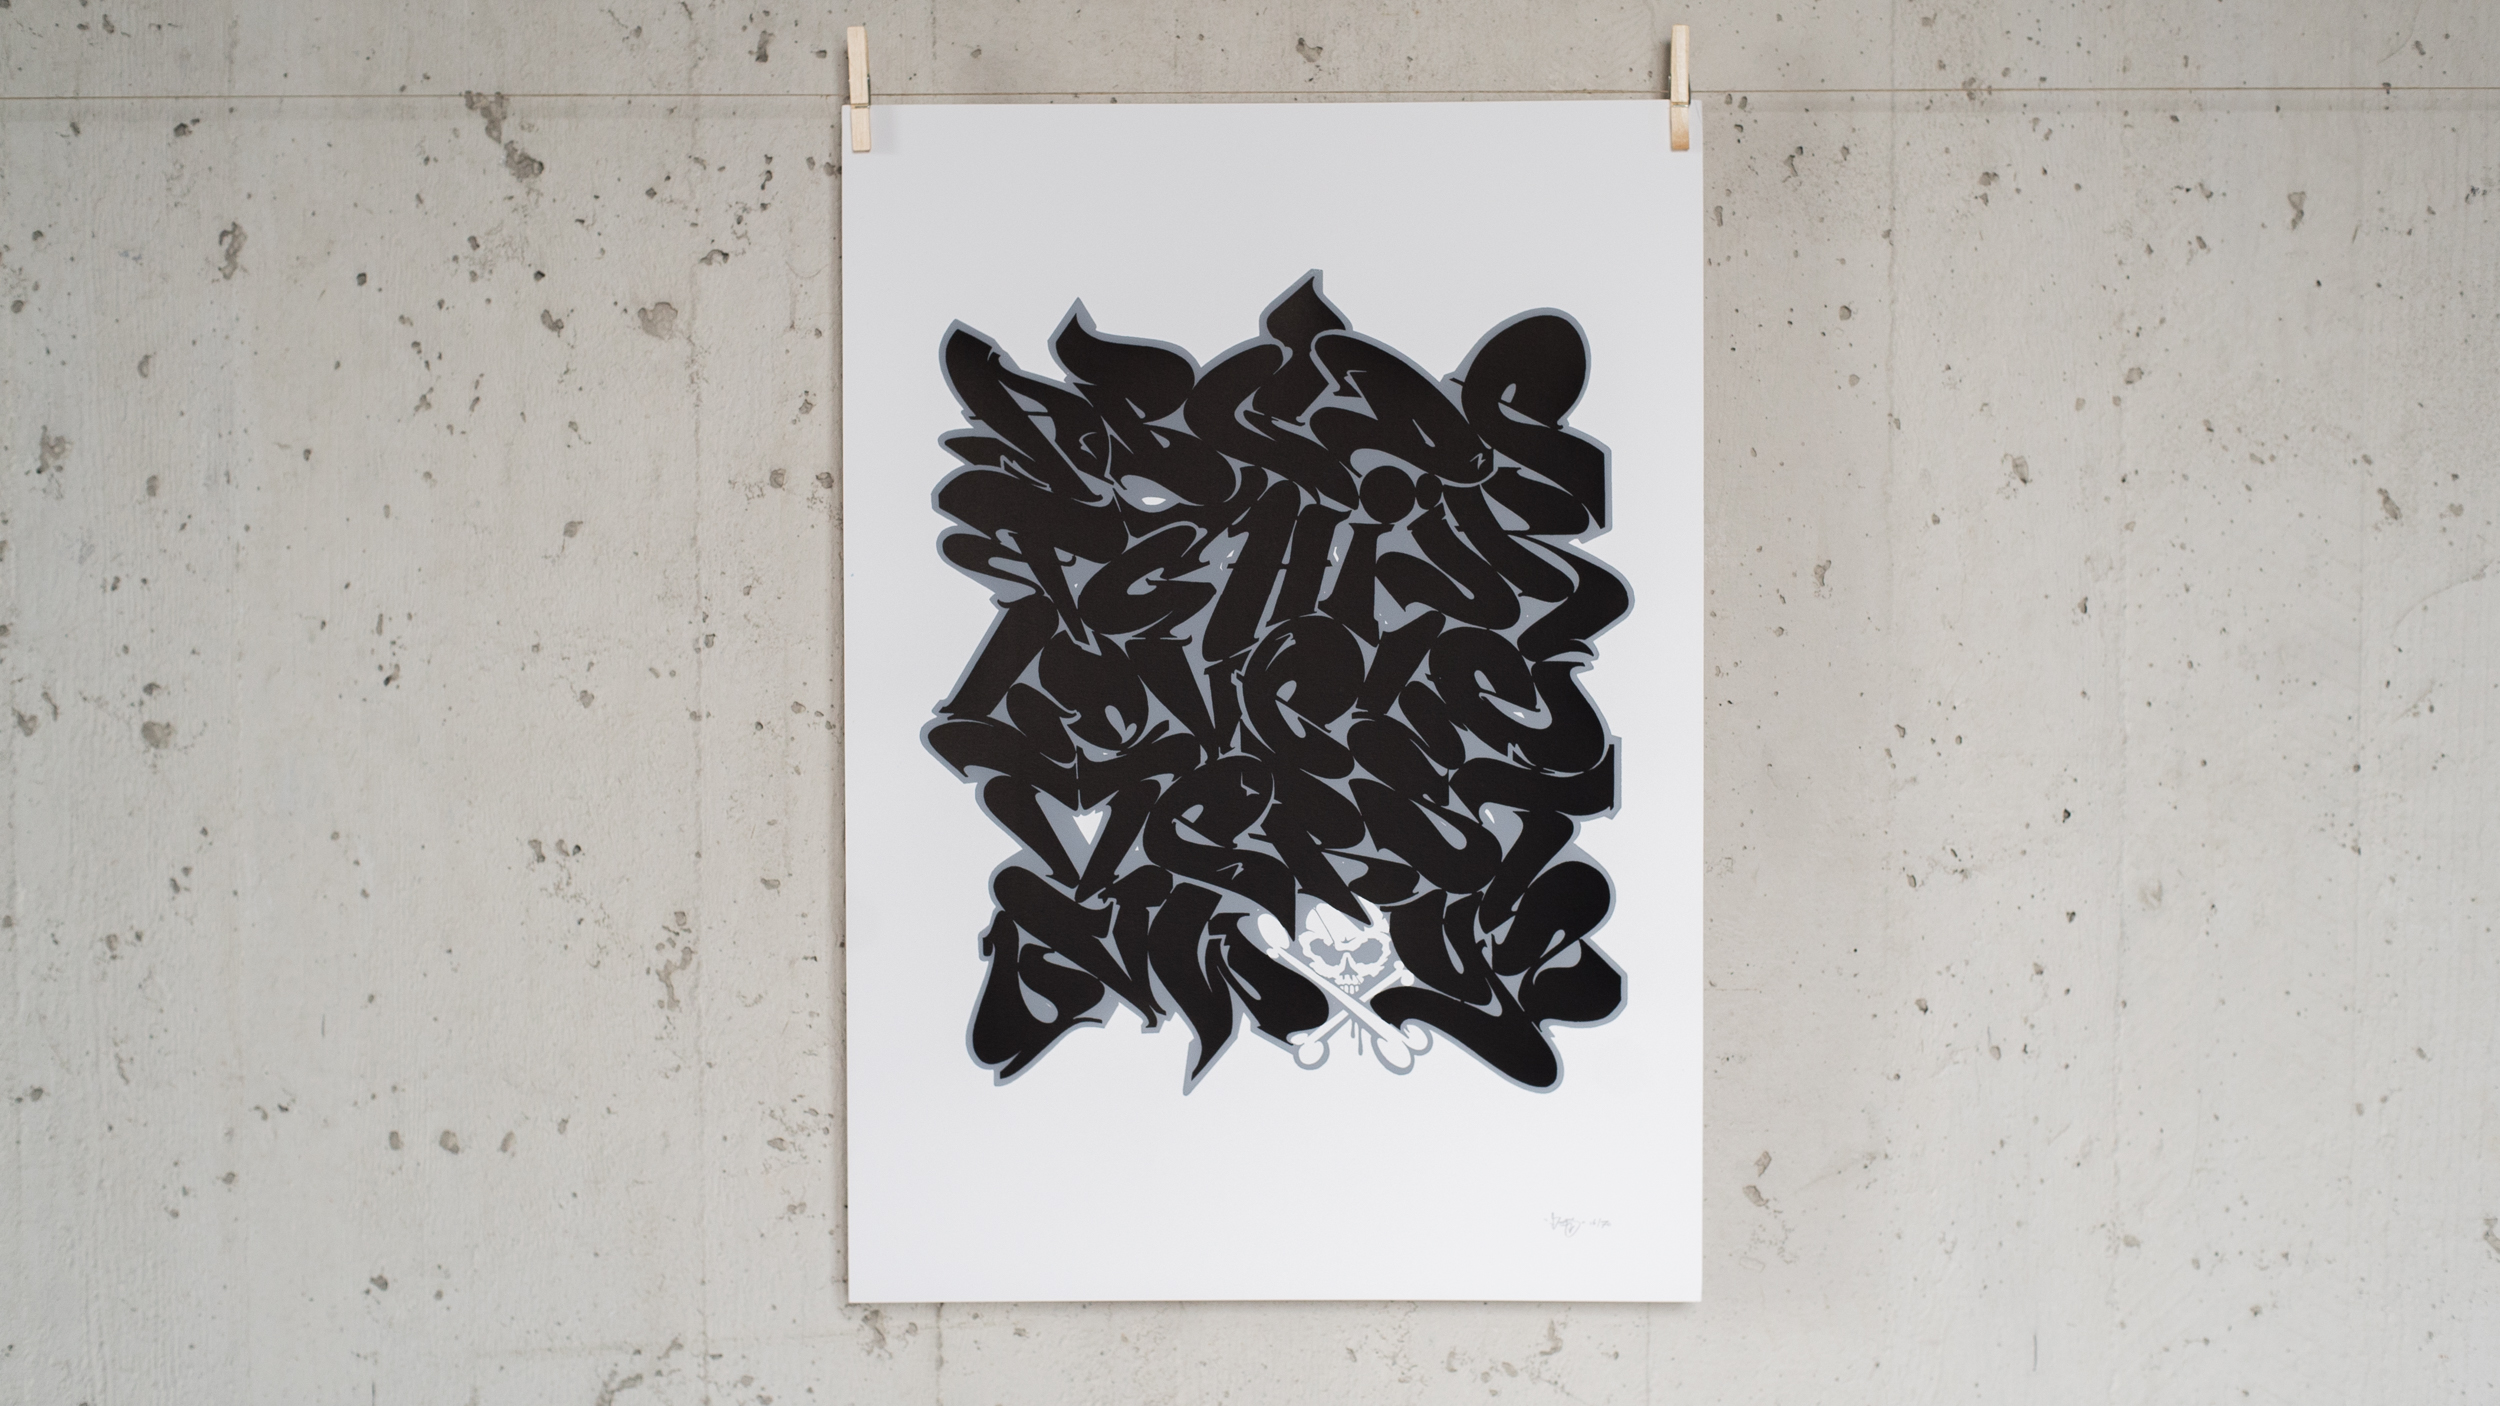 A work by Does - Print alphabet black